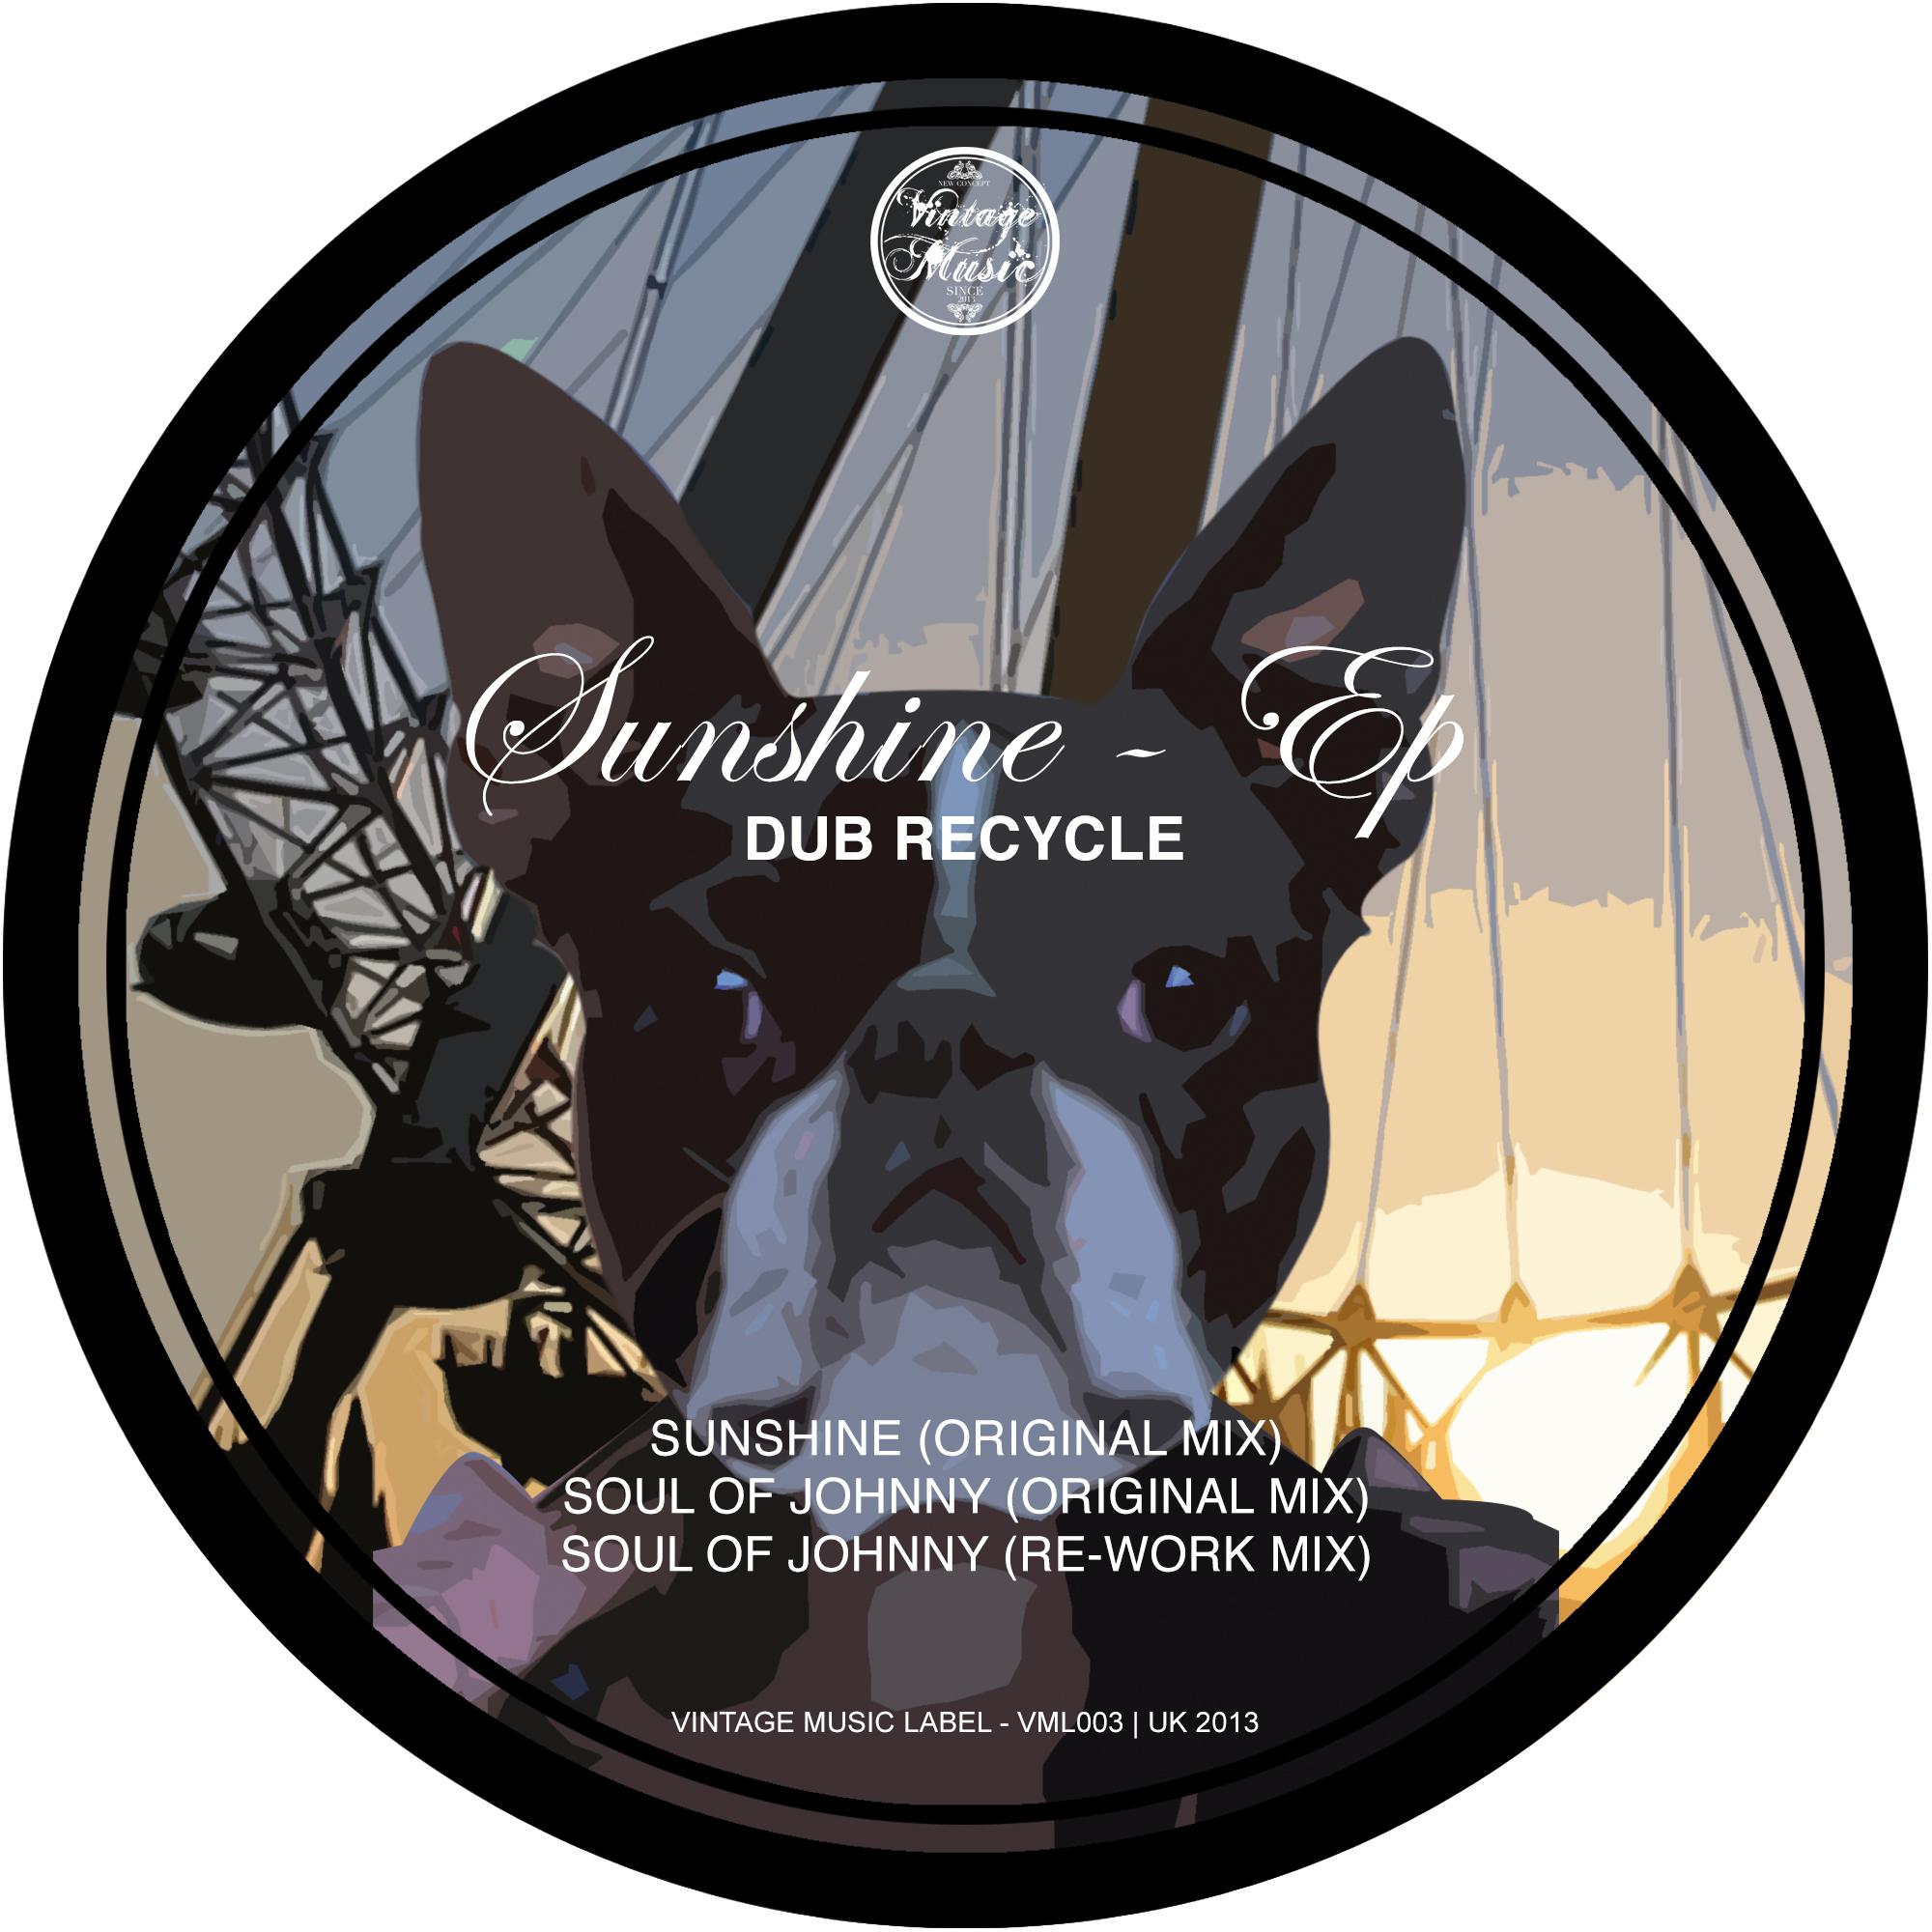 DUB RECYCLE - SUNSHINE - EP _ ARTWORK_FINAL.jpg